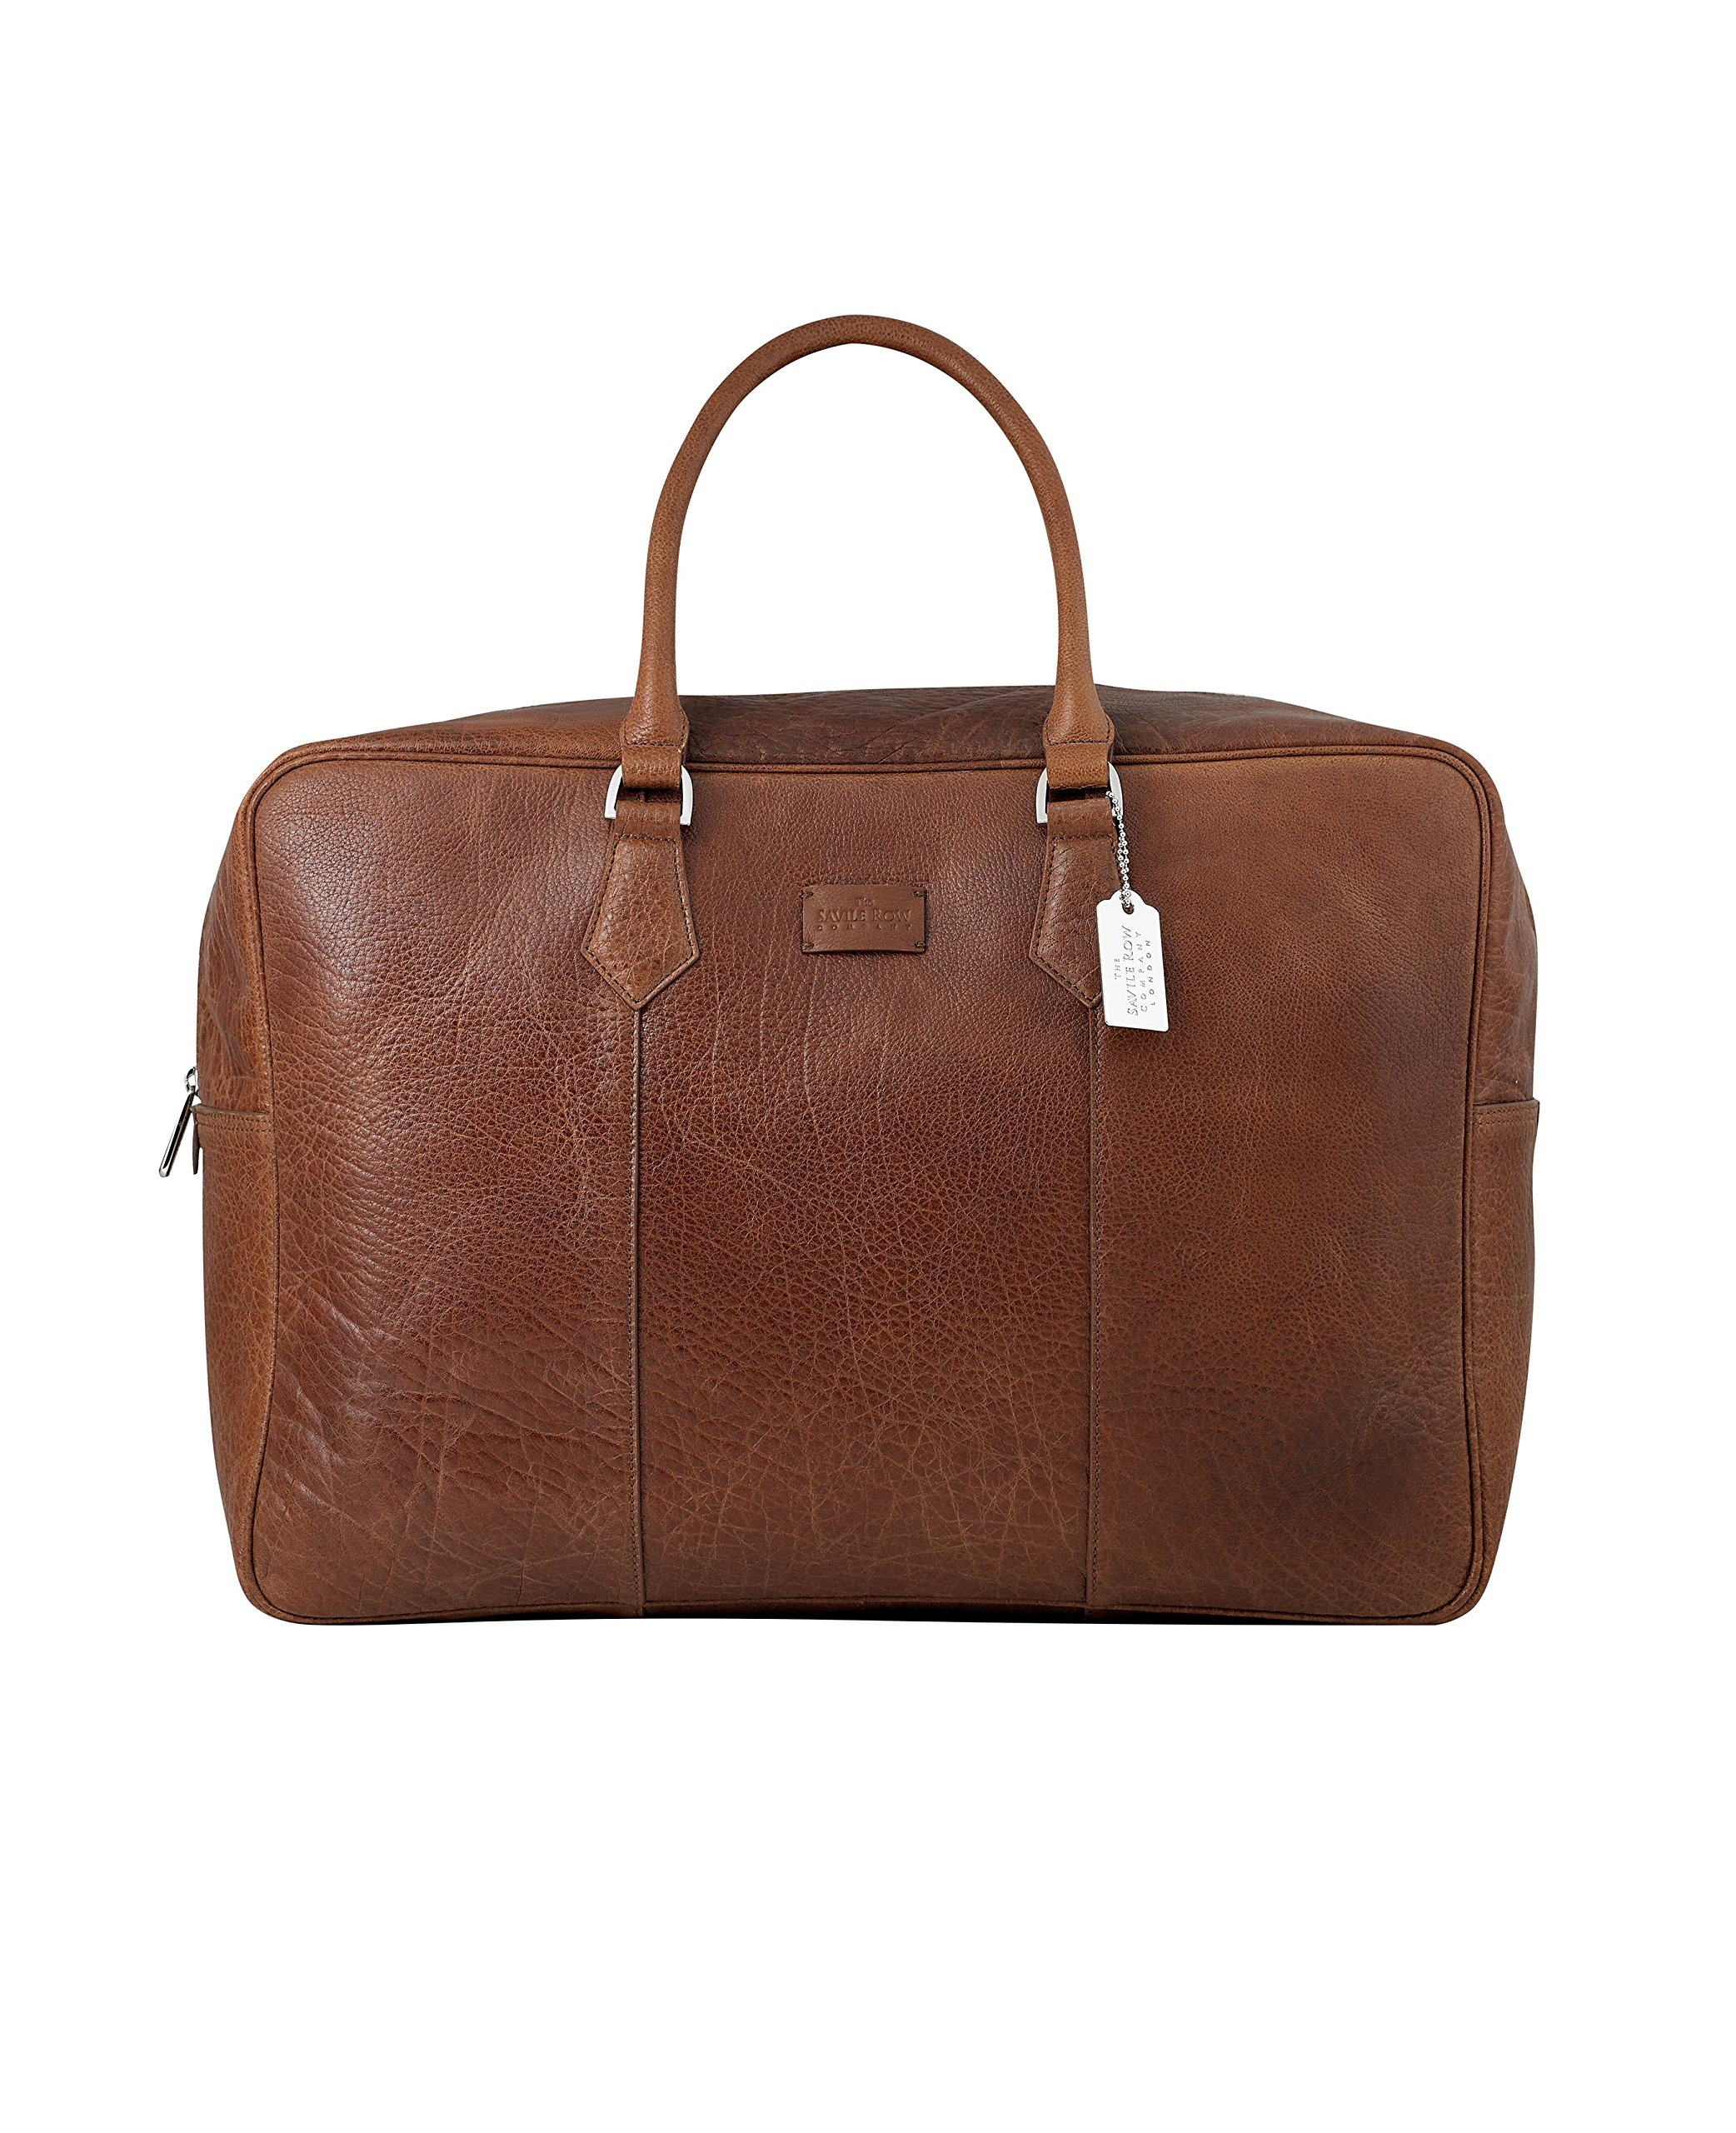 Savile Row Men's Tan Leather Holdall by The Savile Row Company